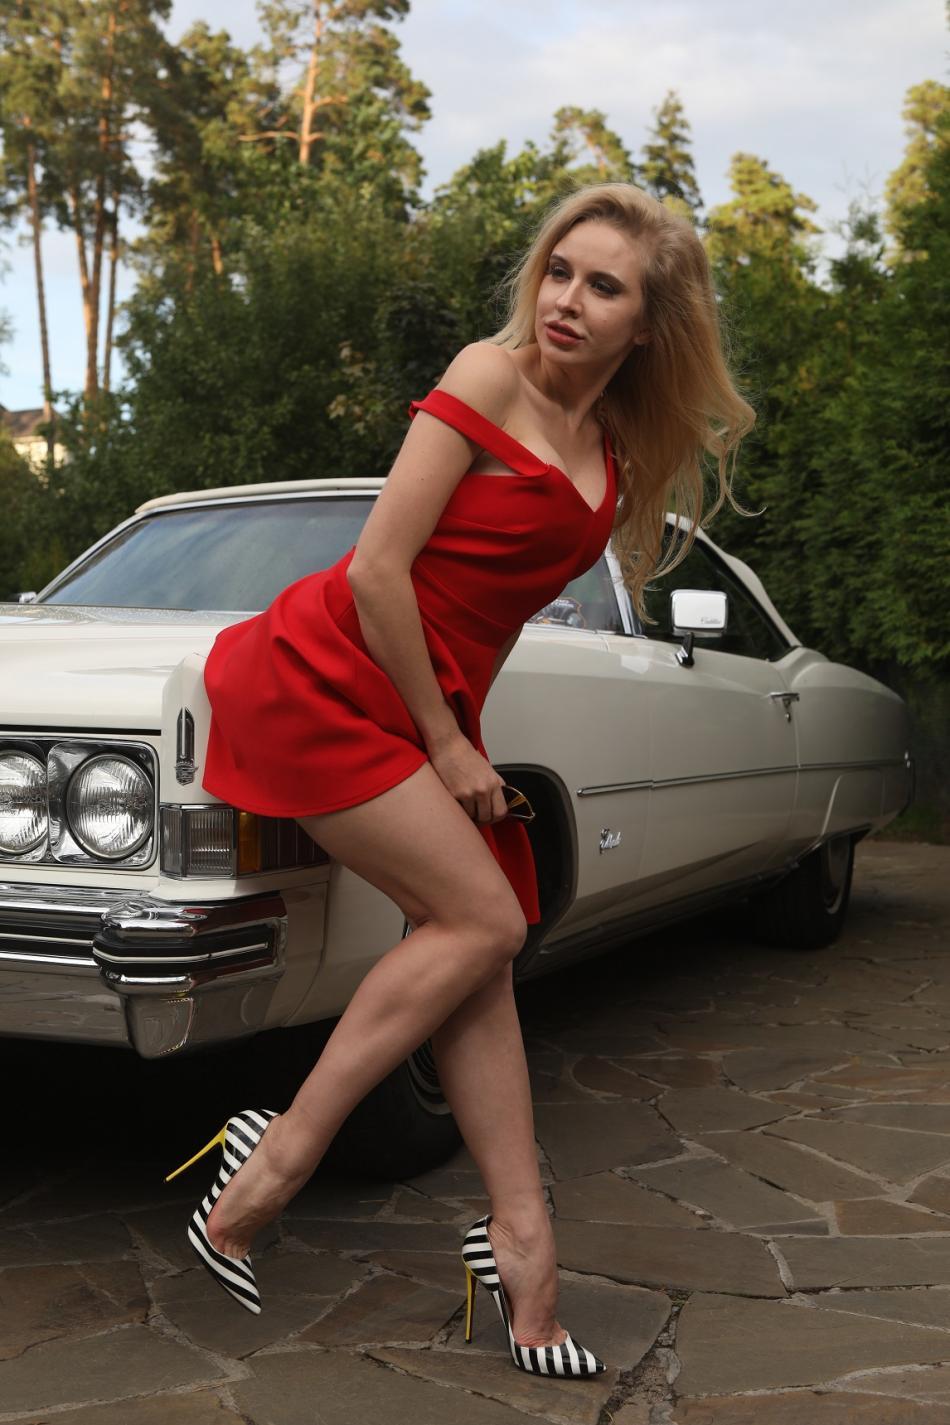 Ladyfordaddy.com Anisha Escort Girl In New York 24075840 - 6 6